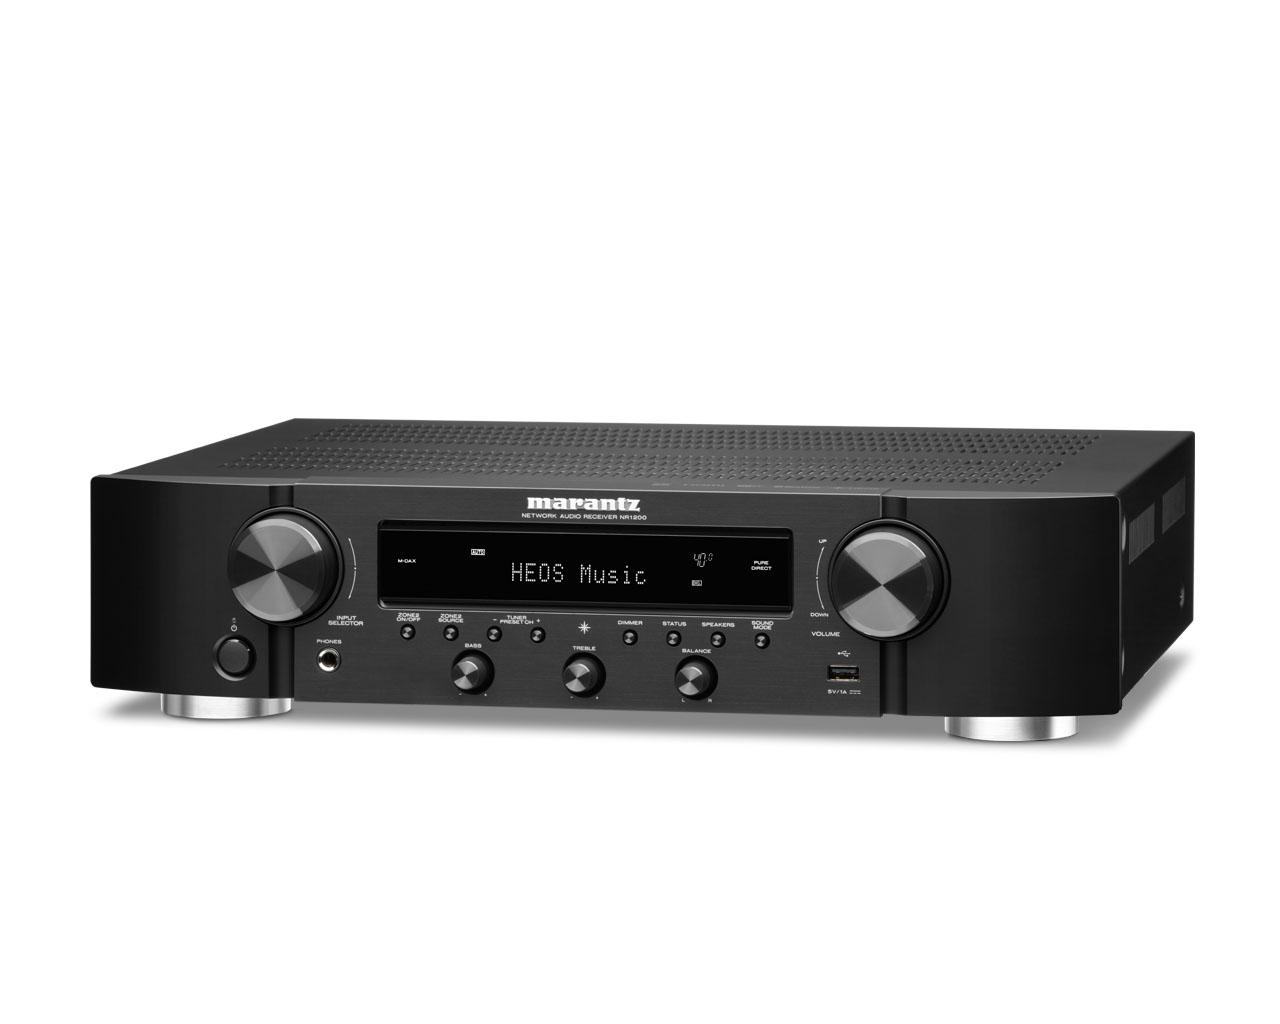 Marantz NR 1200 AV-Receiver kompakter Stereo-Netzwerk-Receiver mit HEOS schwarz